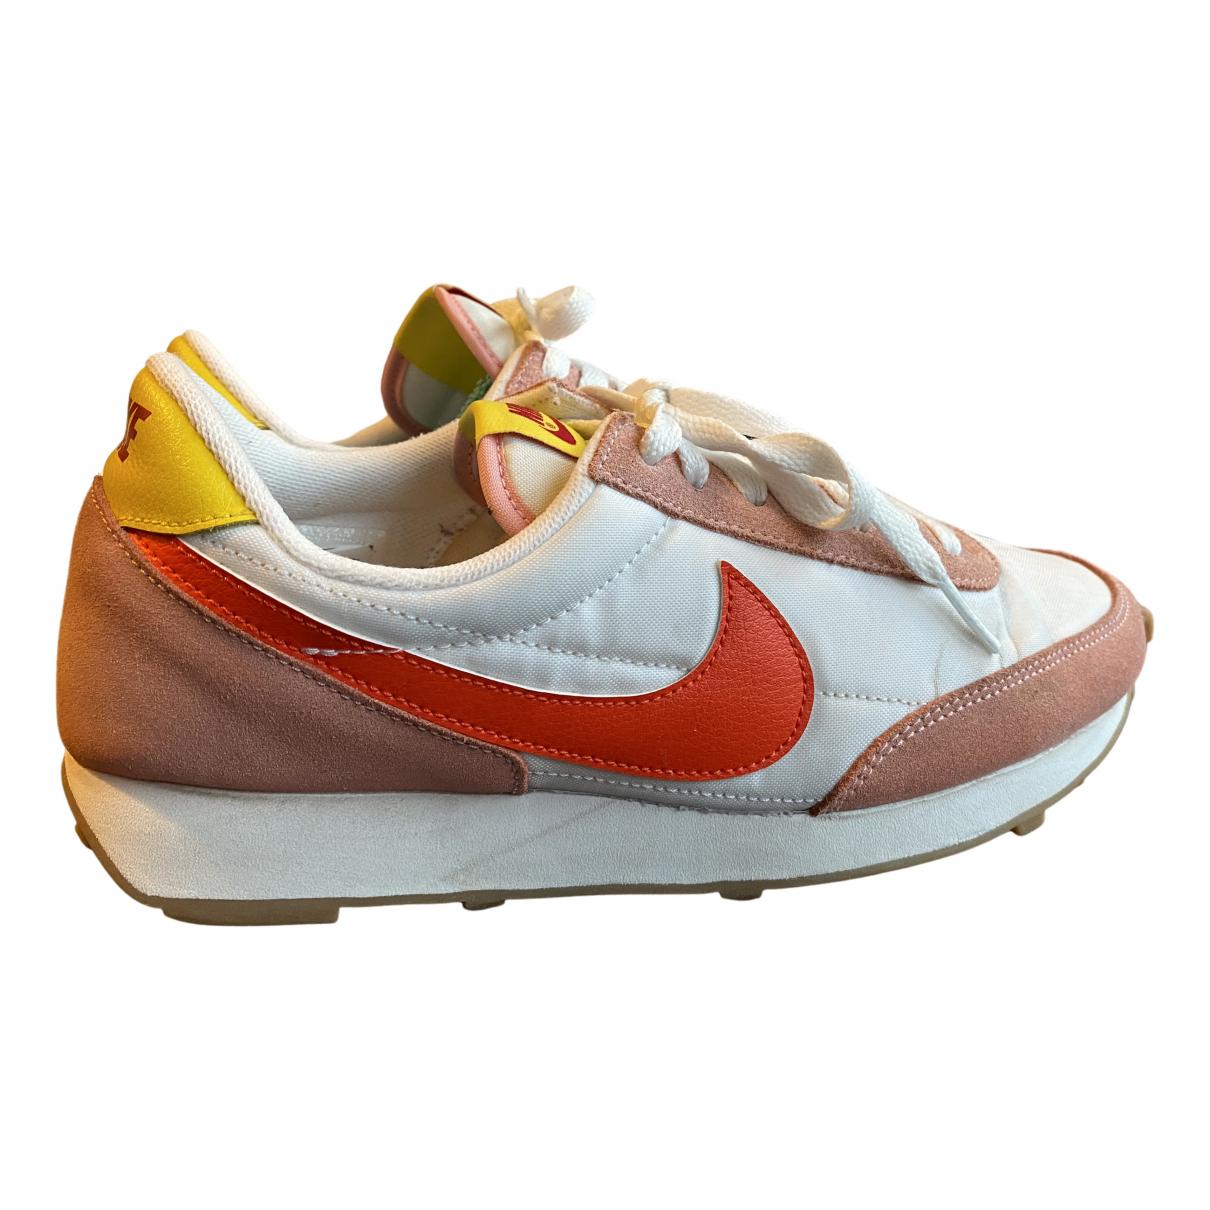 Nike N White Suede Trainers for Women 38 EU